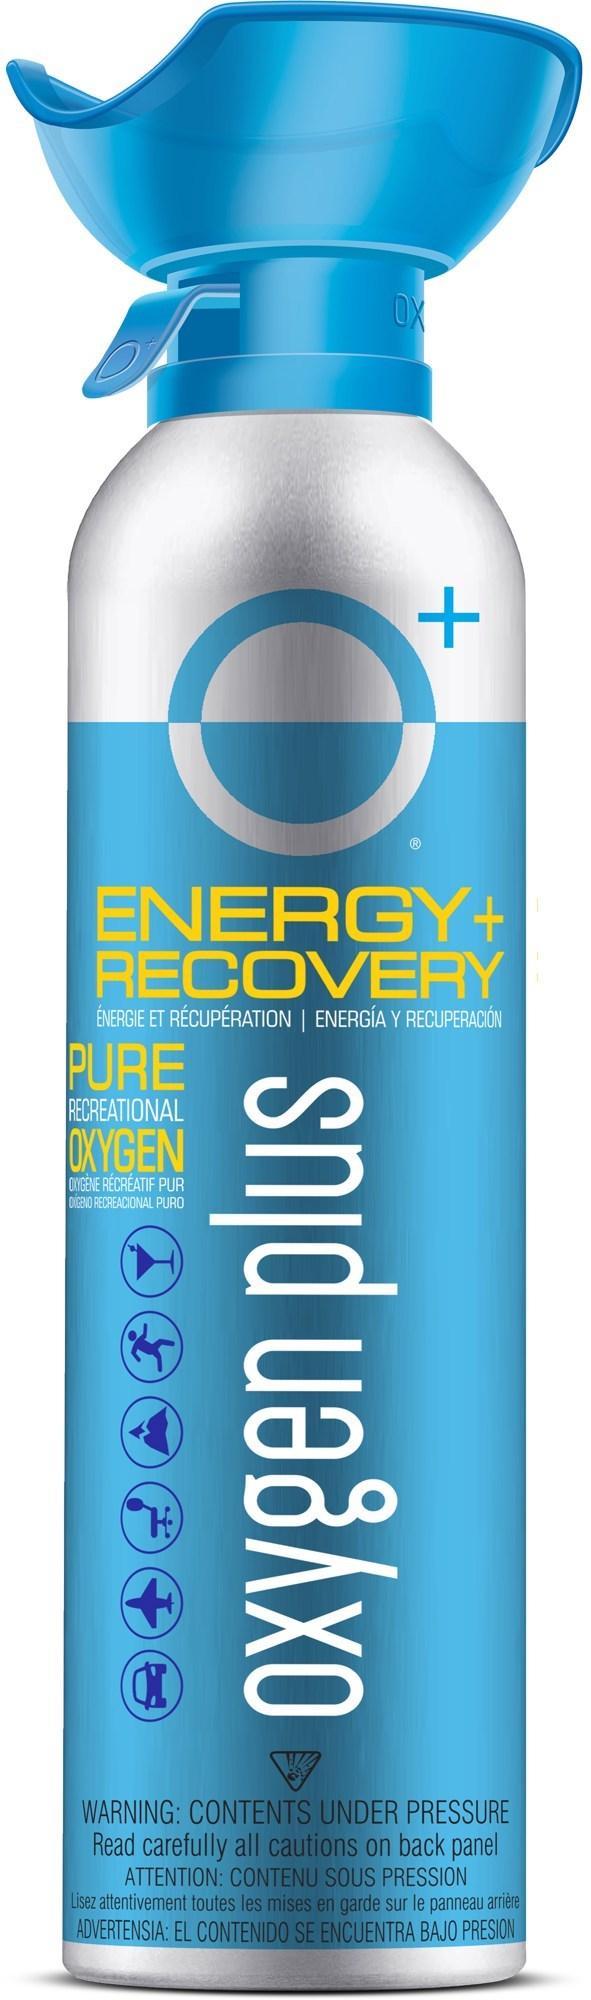 O+ Biggi from Oxygen Plus